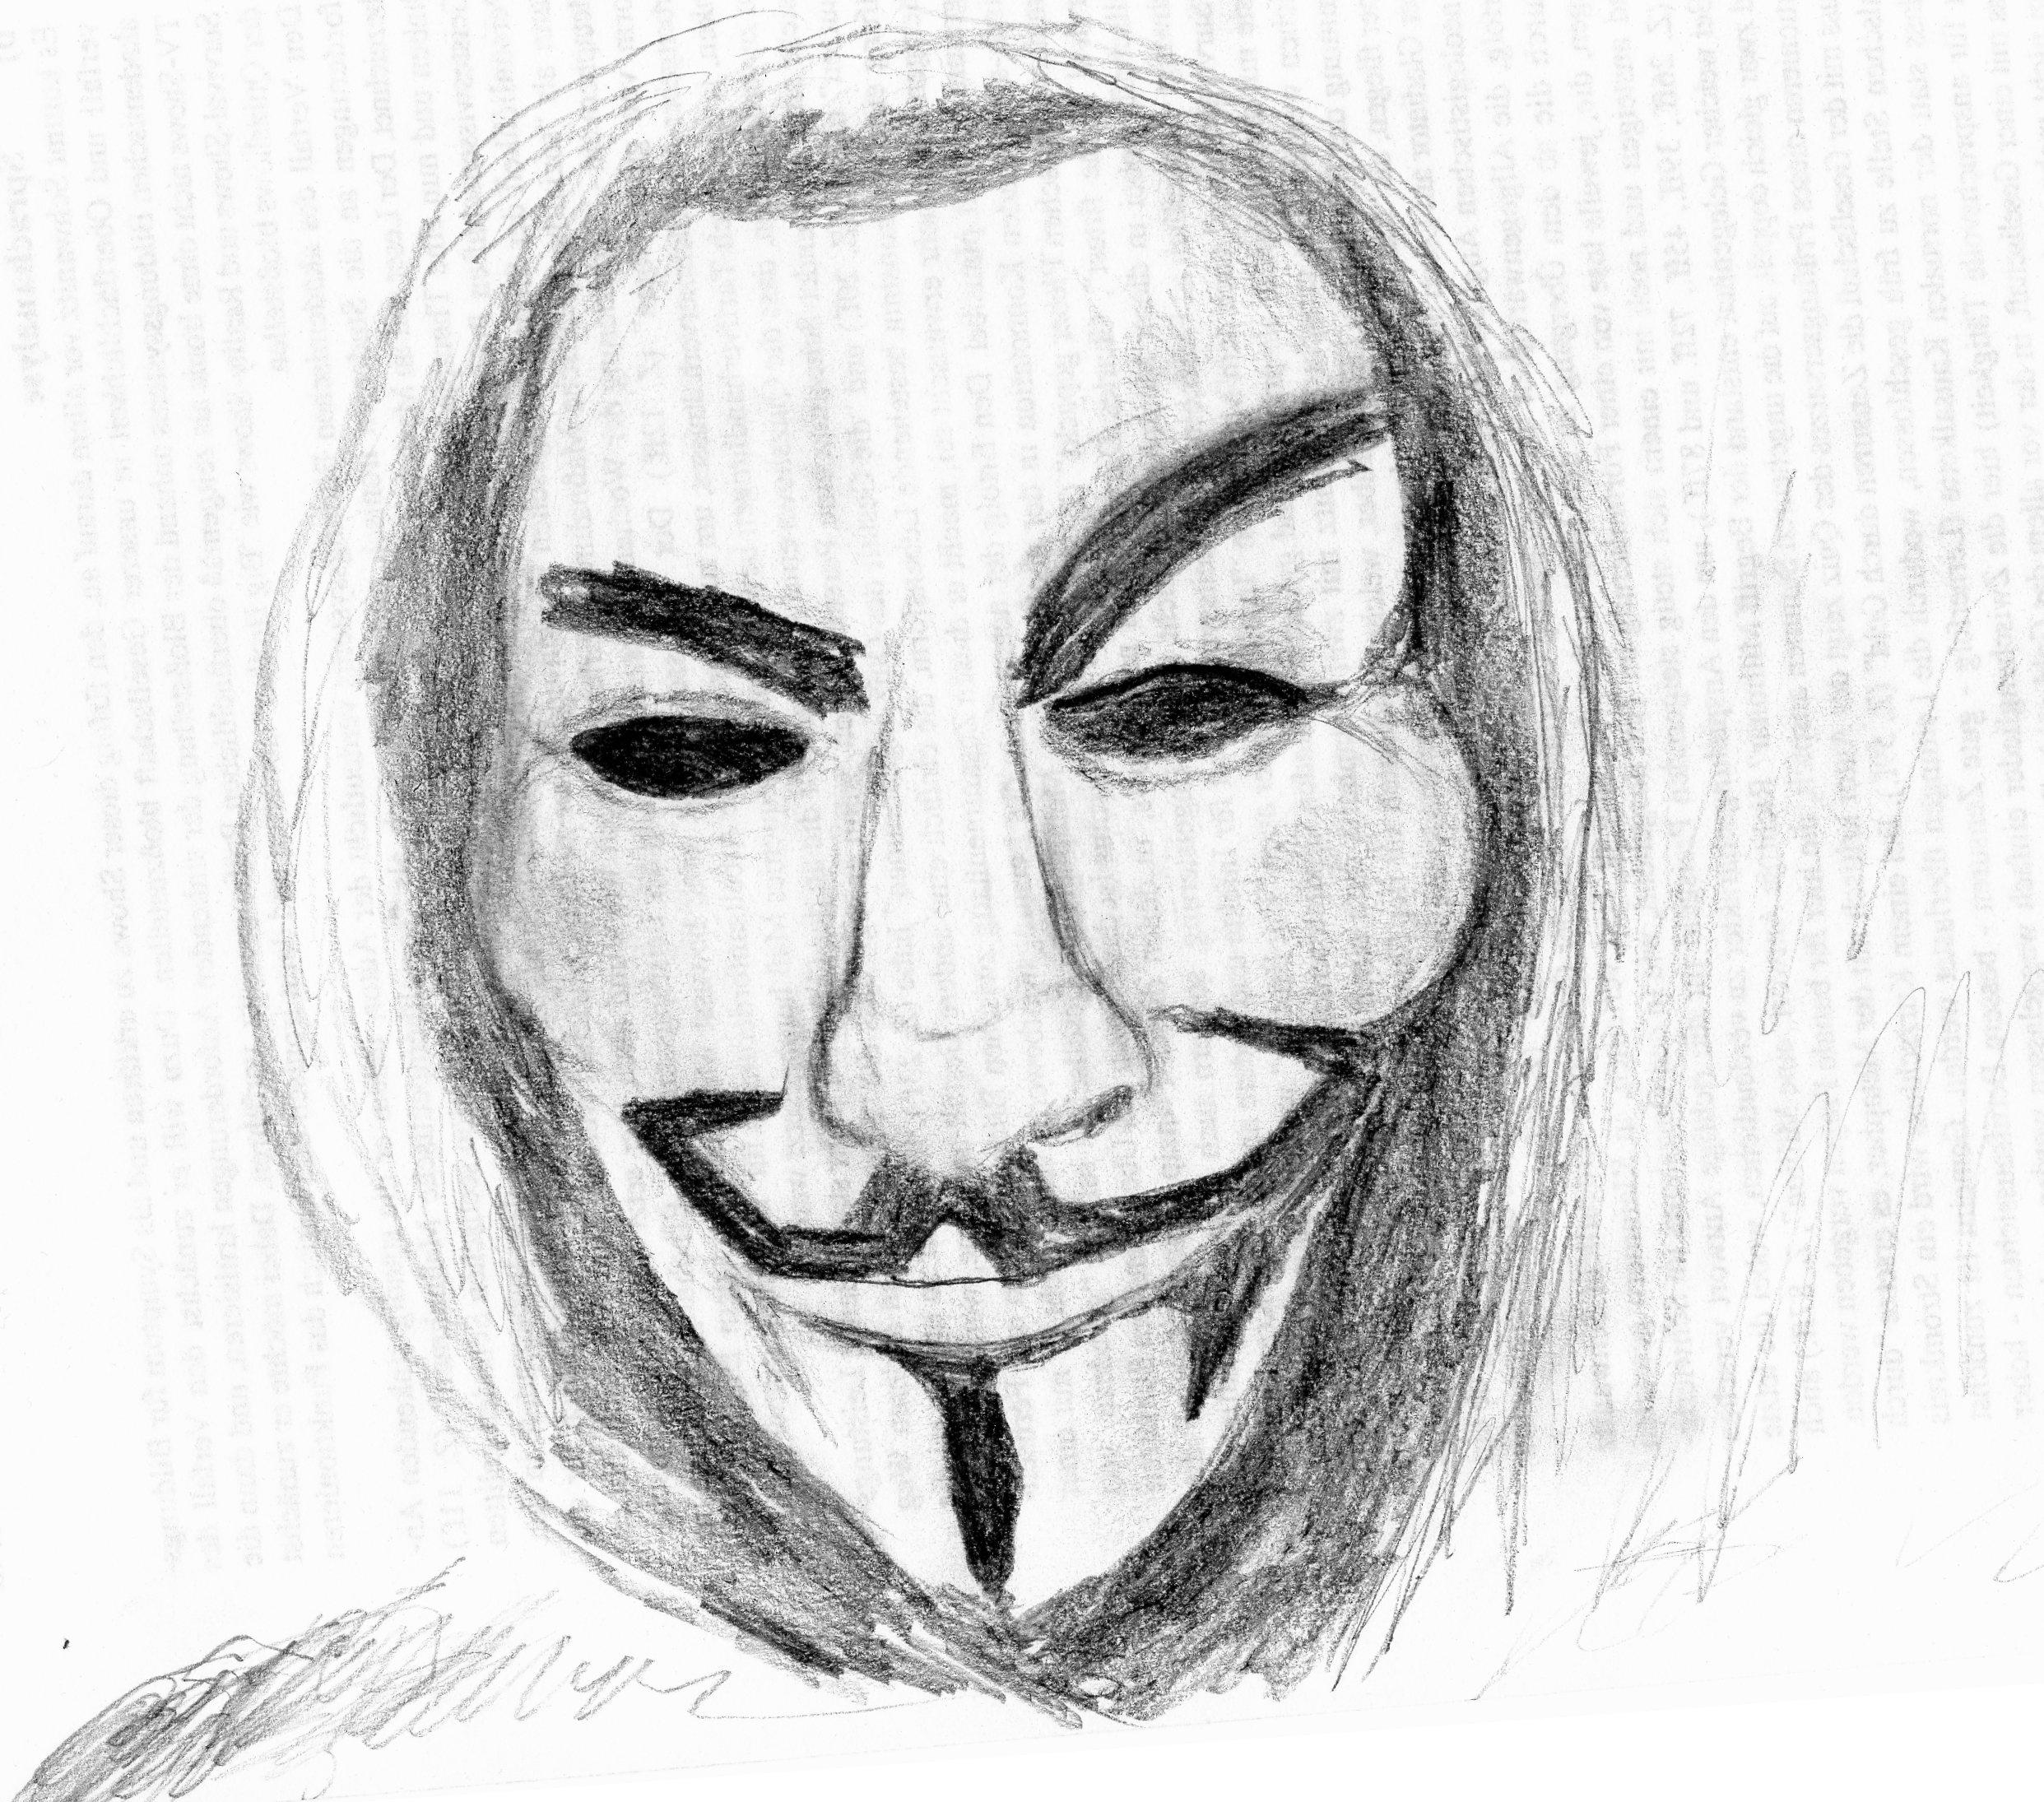 Guy Fawkes Mask By Punkandartstjimmy On Deviantart